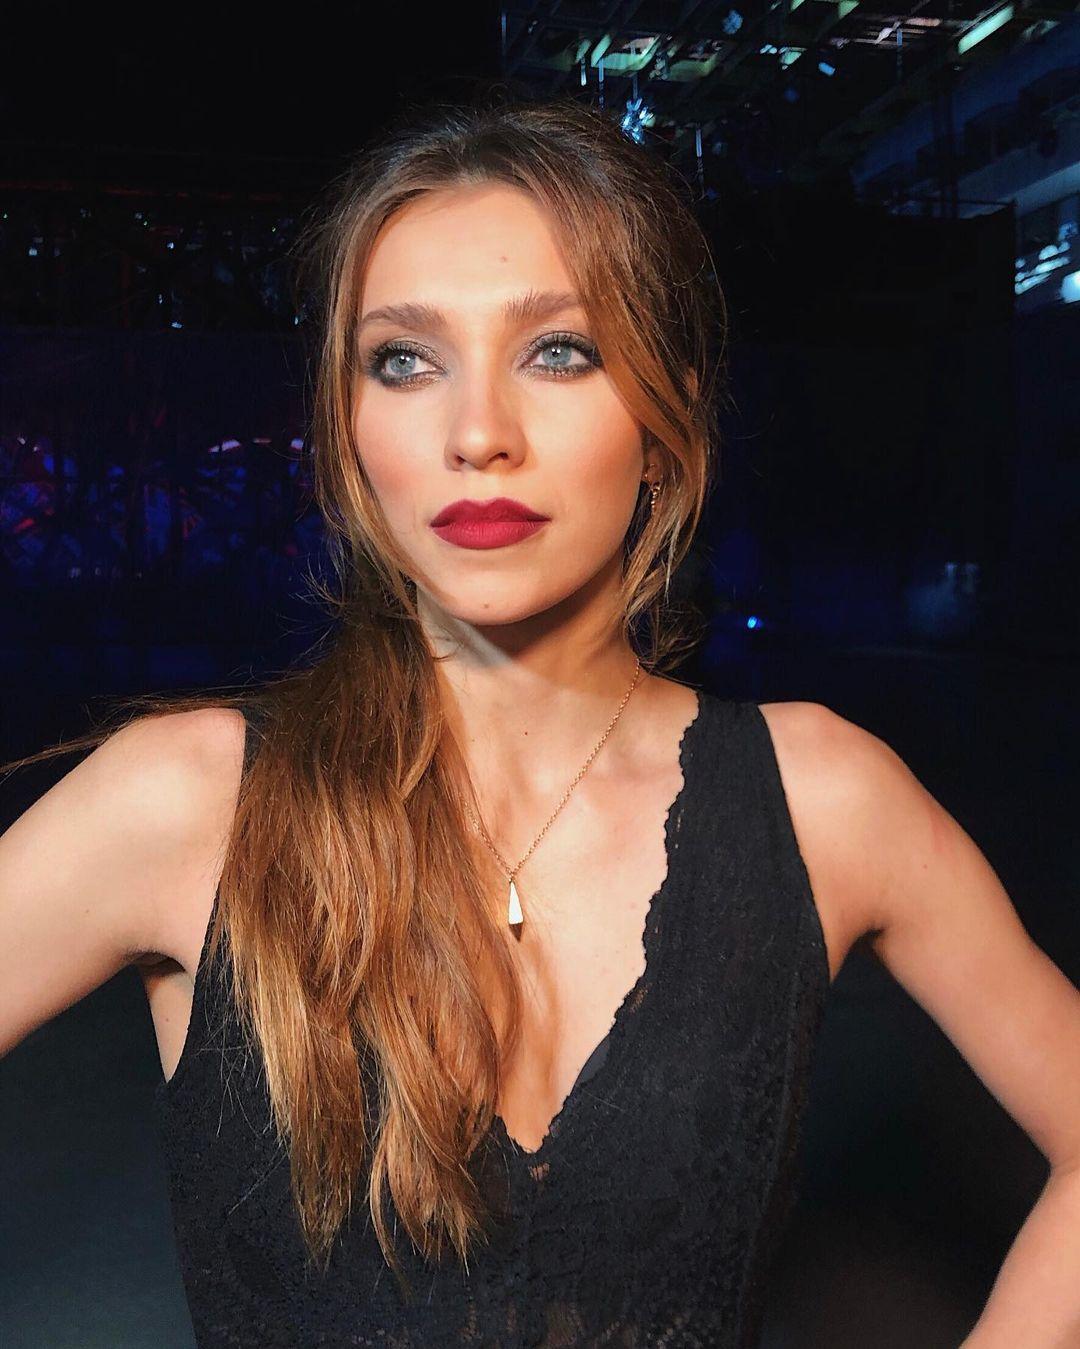 Регина Тодоренко резко ответила на критику своей груди